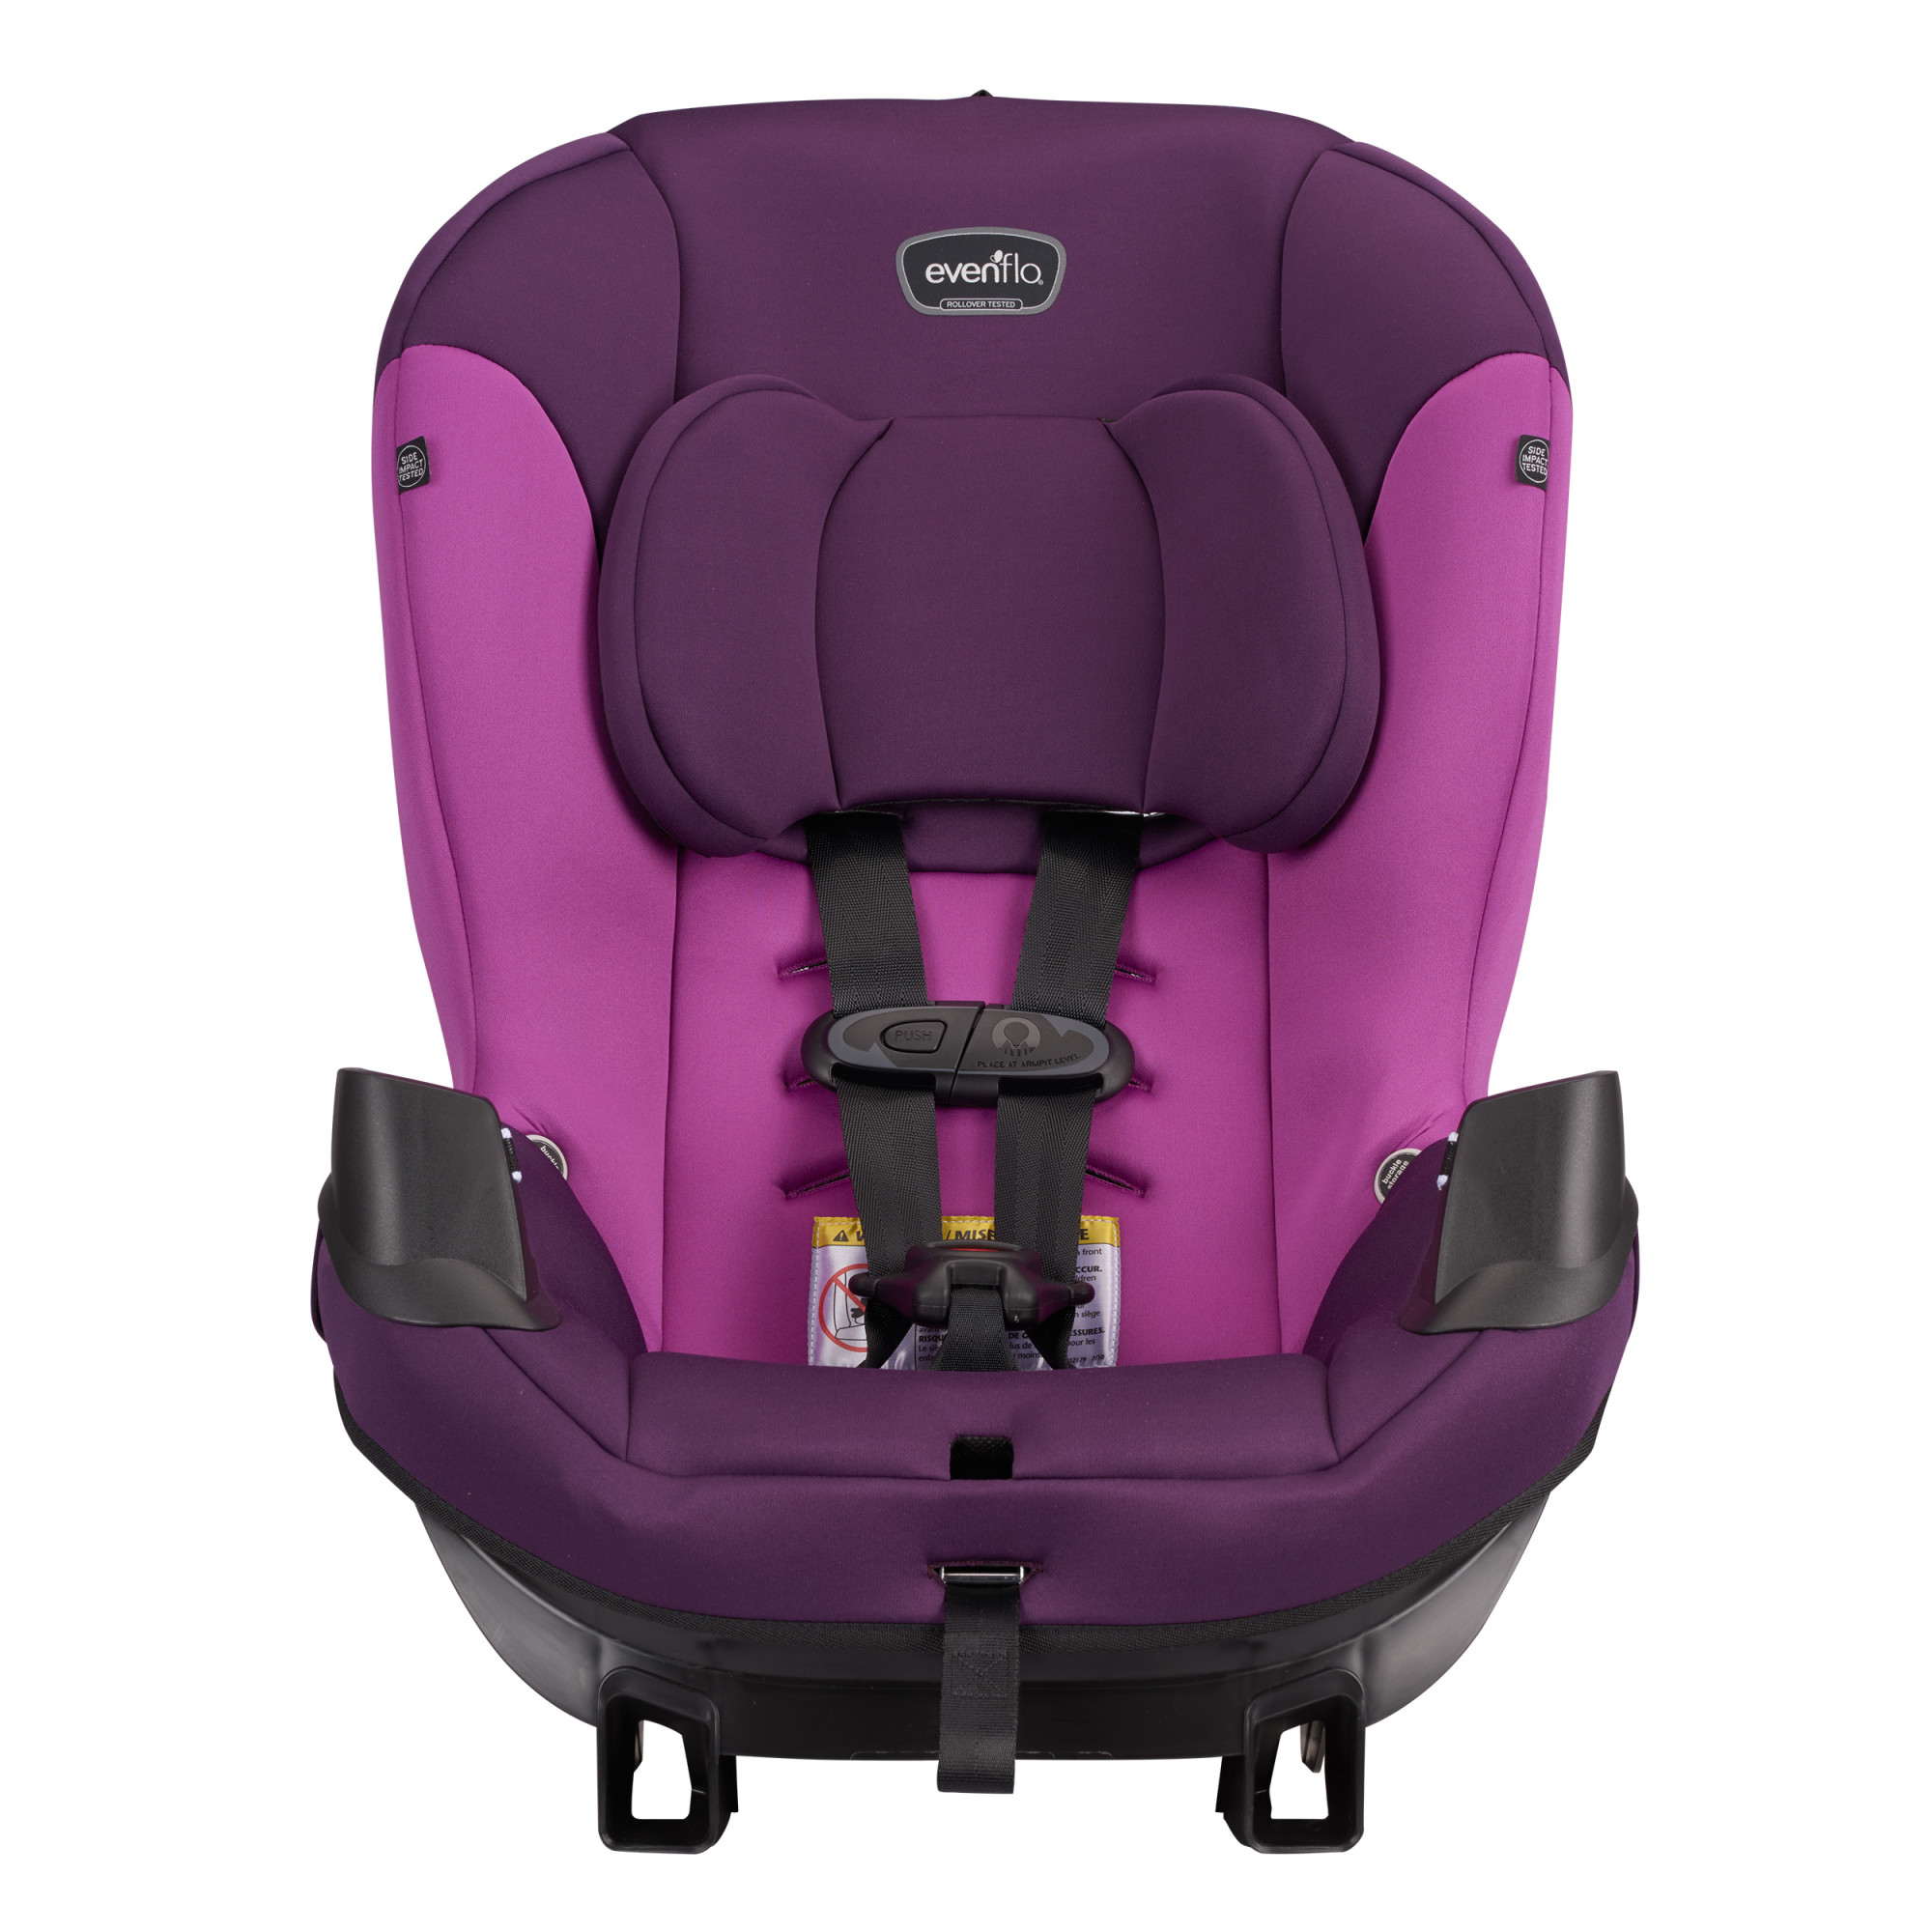 Evenflo New Sonus Convertible Baby Car Seat